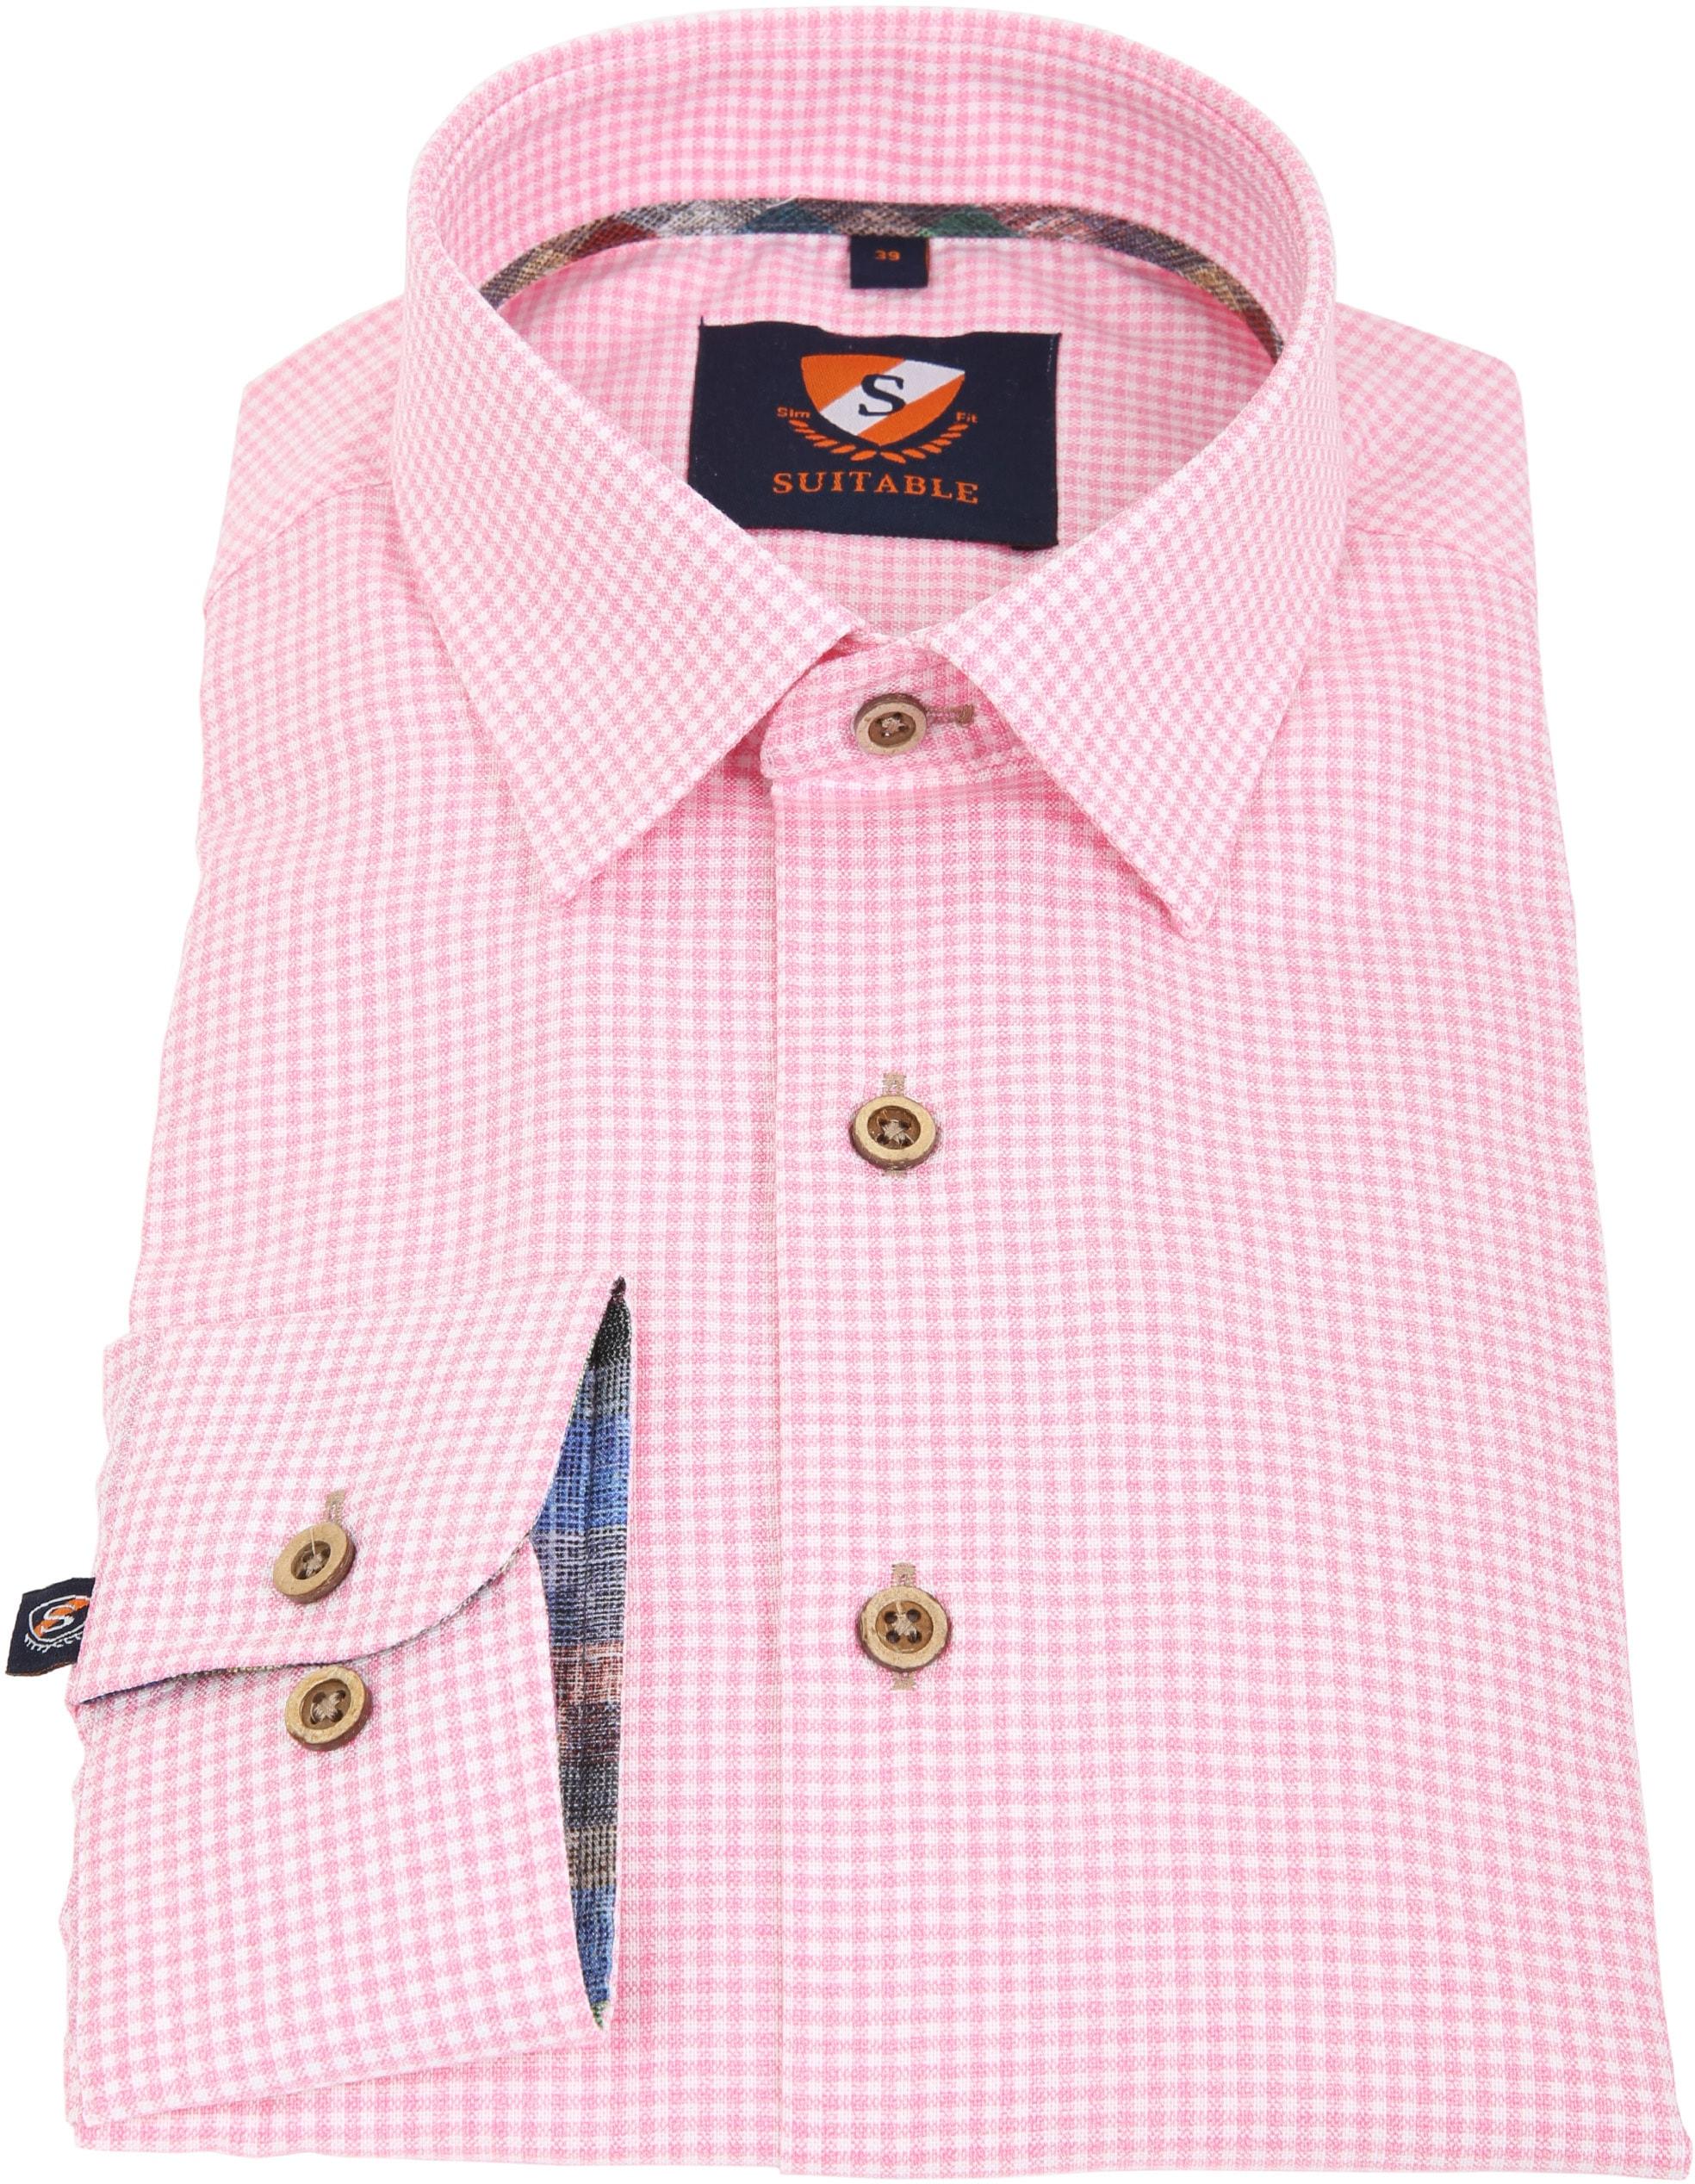 Suitable Overhemd Roze Ruit 181-6 foto 2